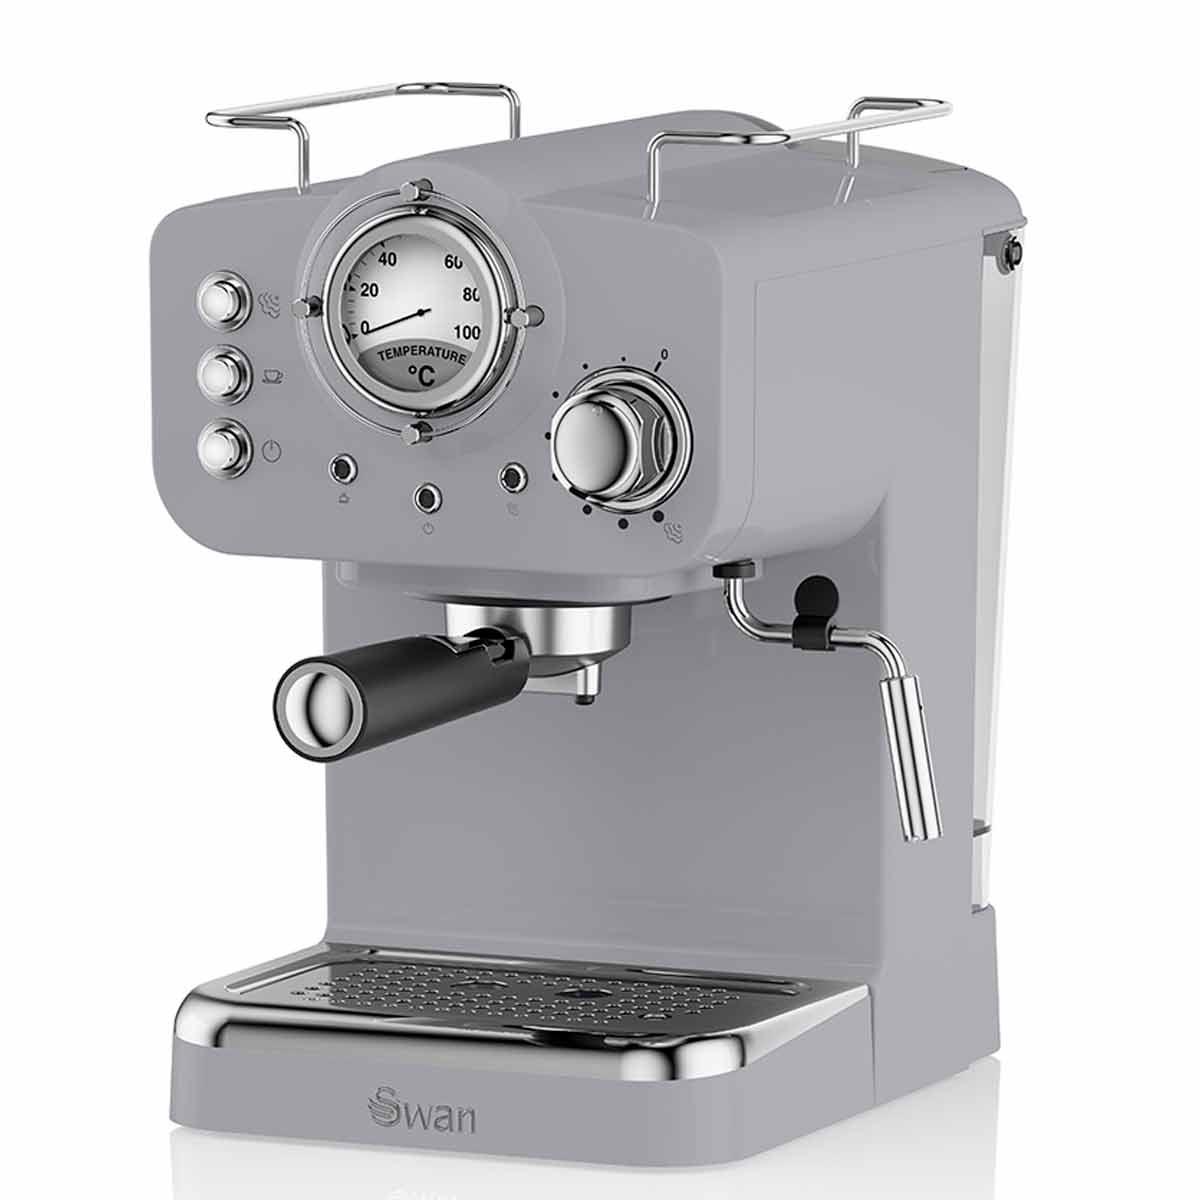 Swan Retro Espresso Coffee Machine, Grey